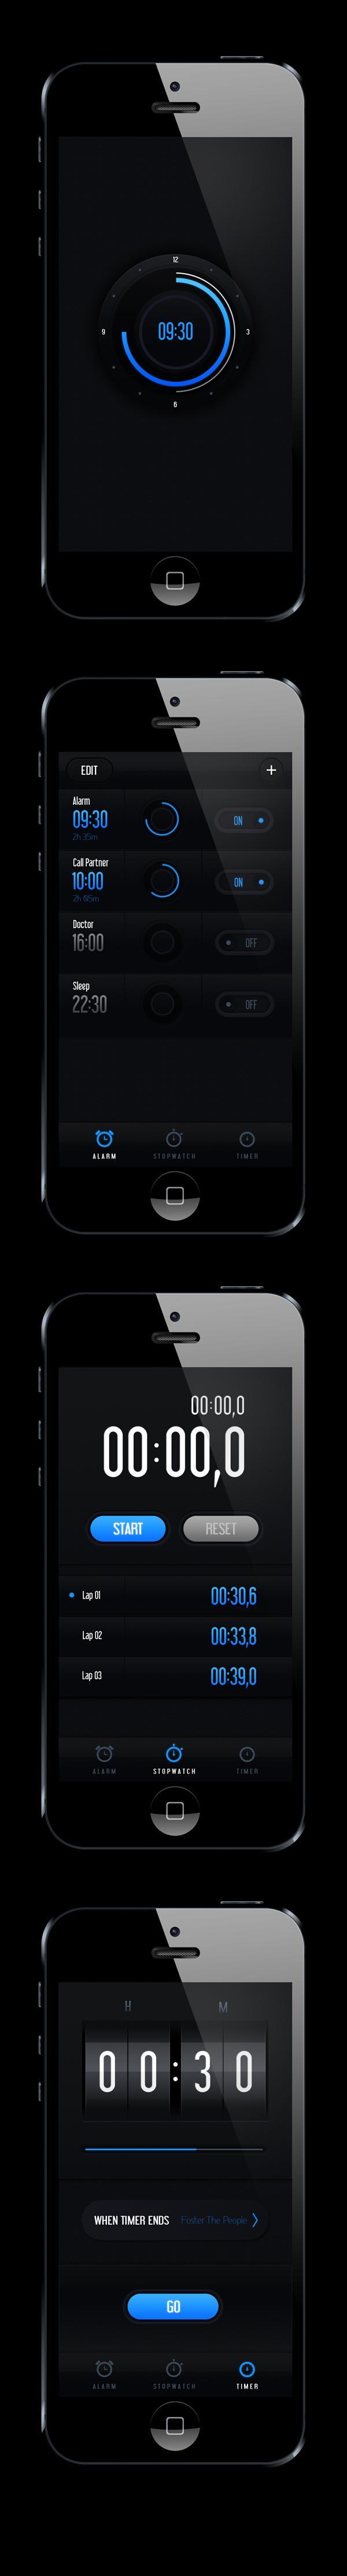 Clock Concept on